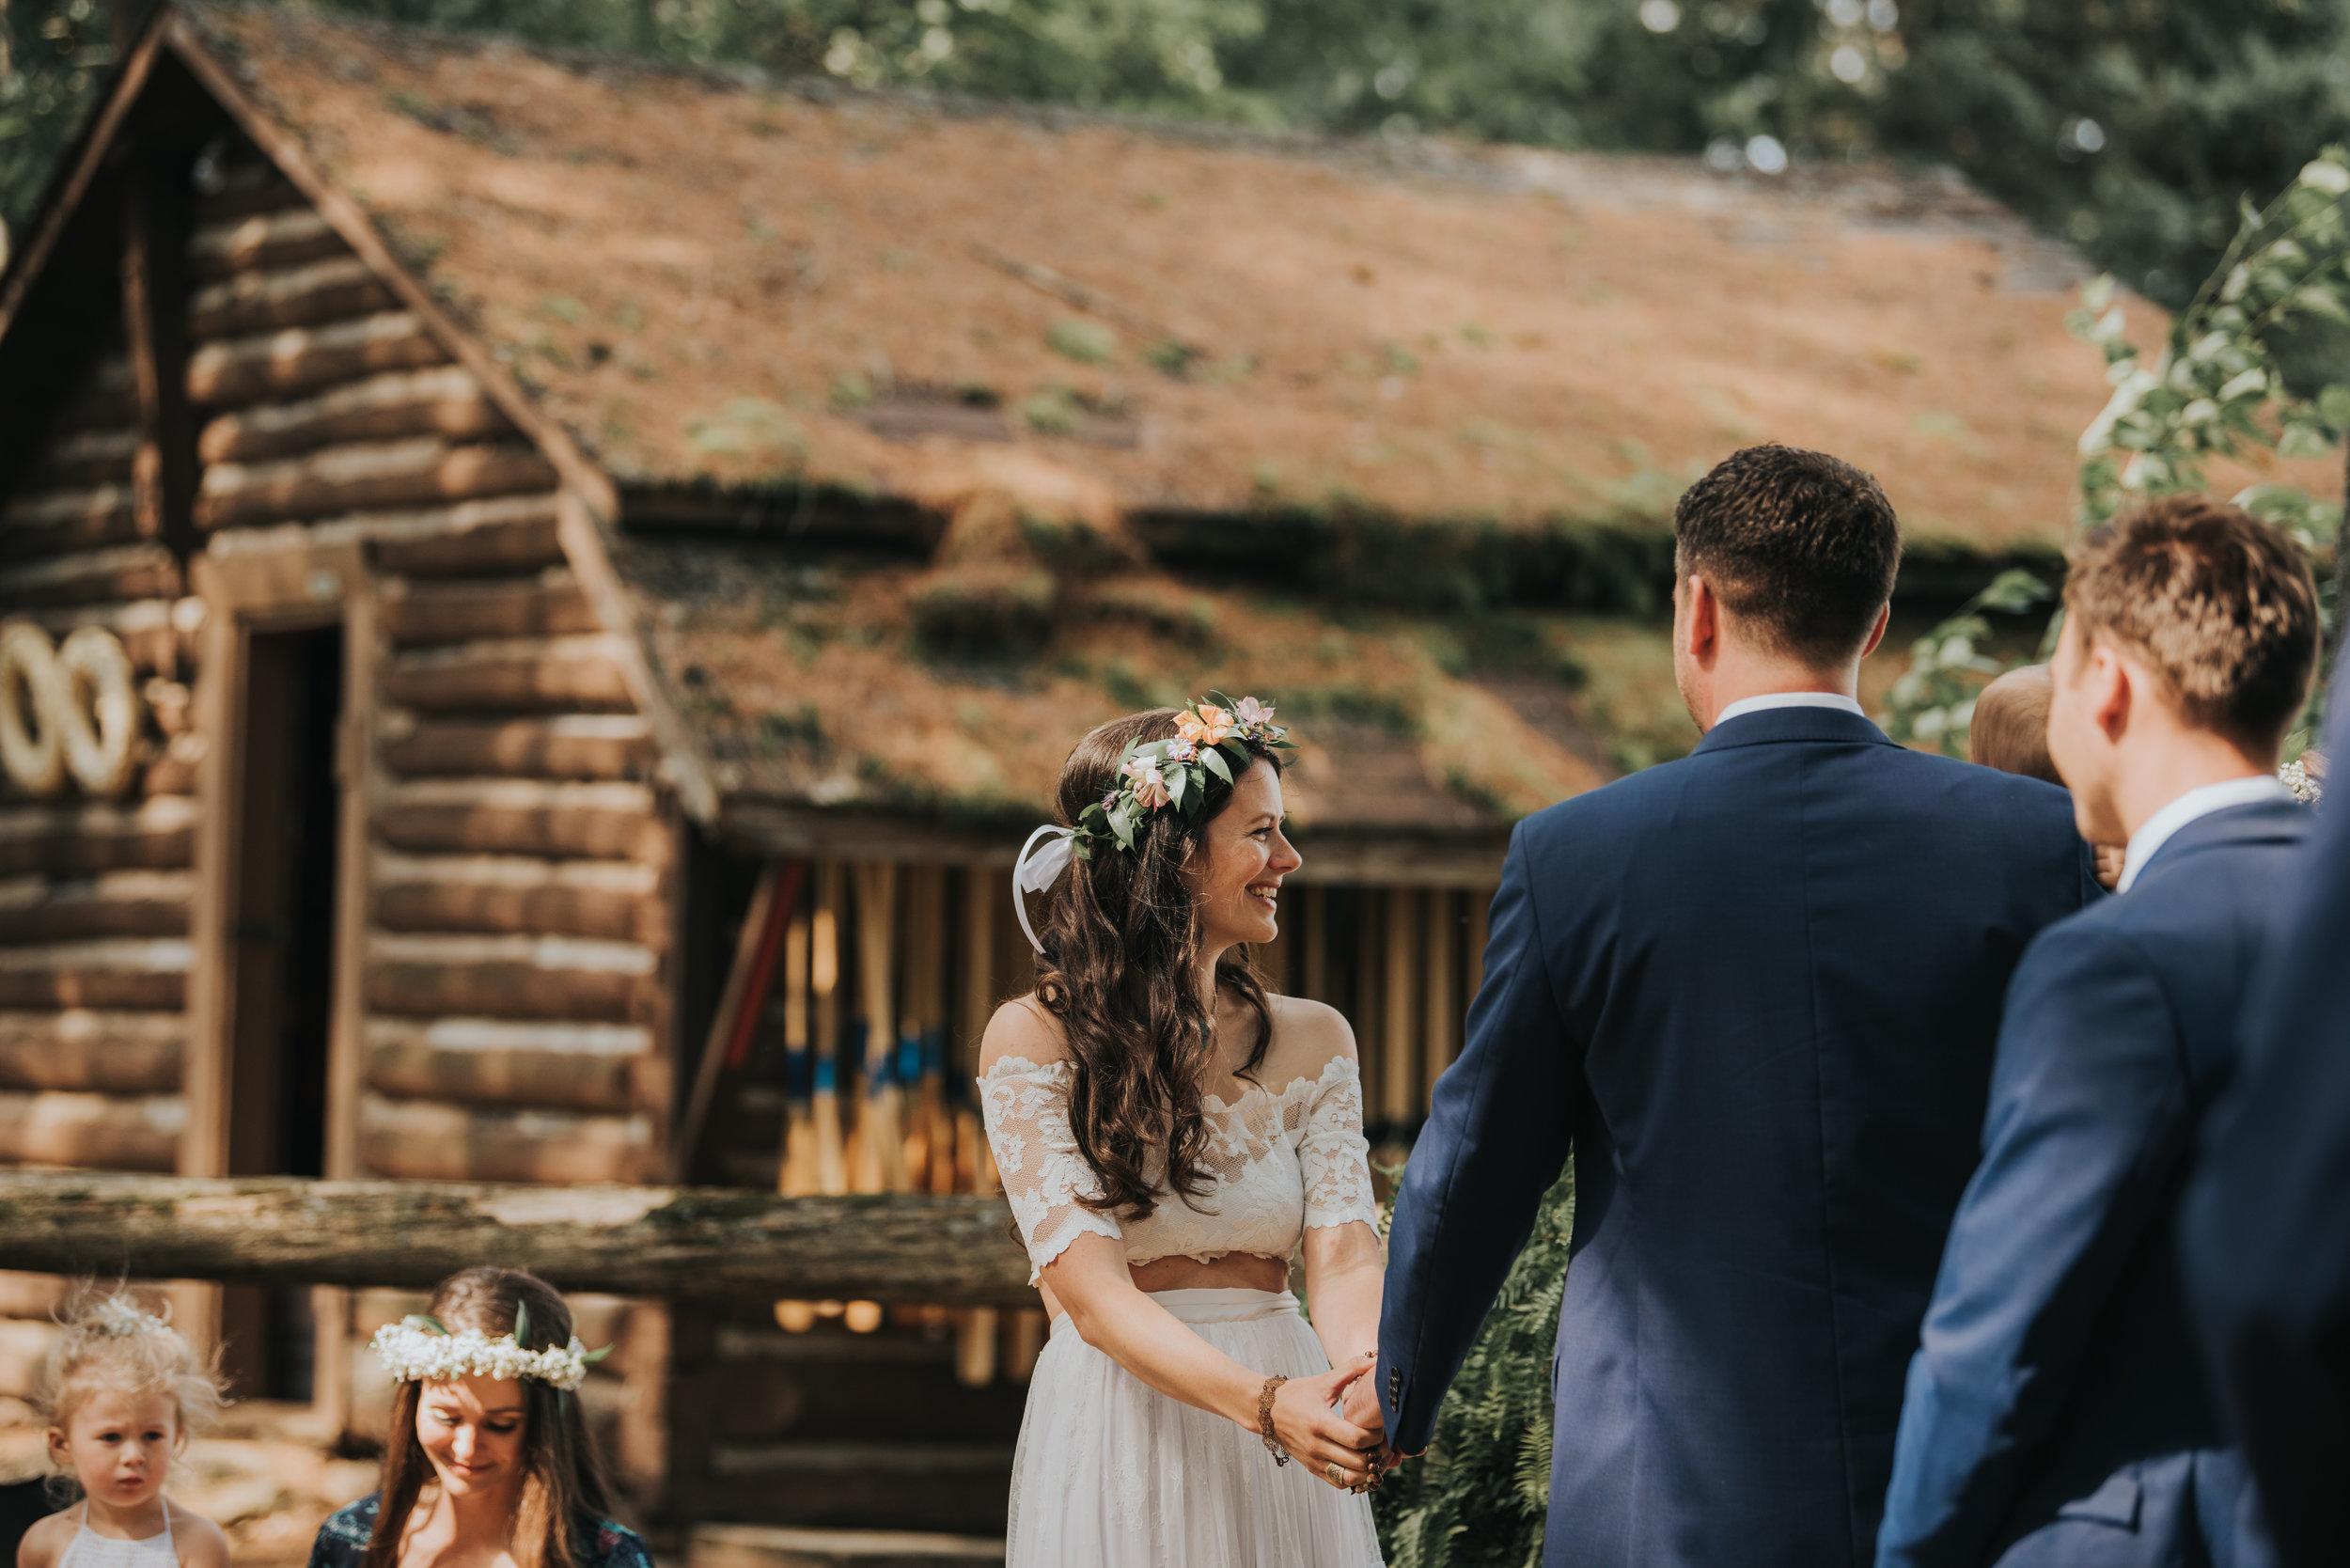 bride-exchanging-vows-toronto-bohemian-boho-outdoor-summer-wedding-documentary-wedding-photography-by-willow-birch-photo.jpg